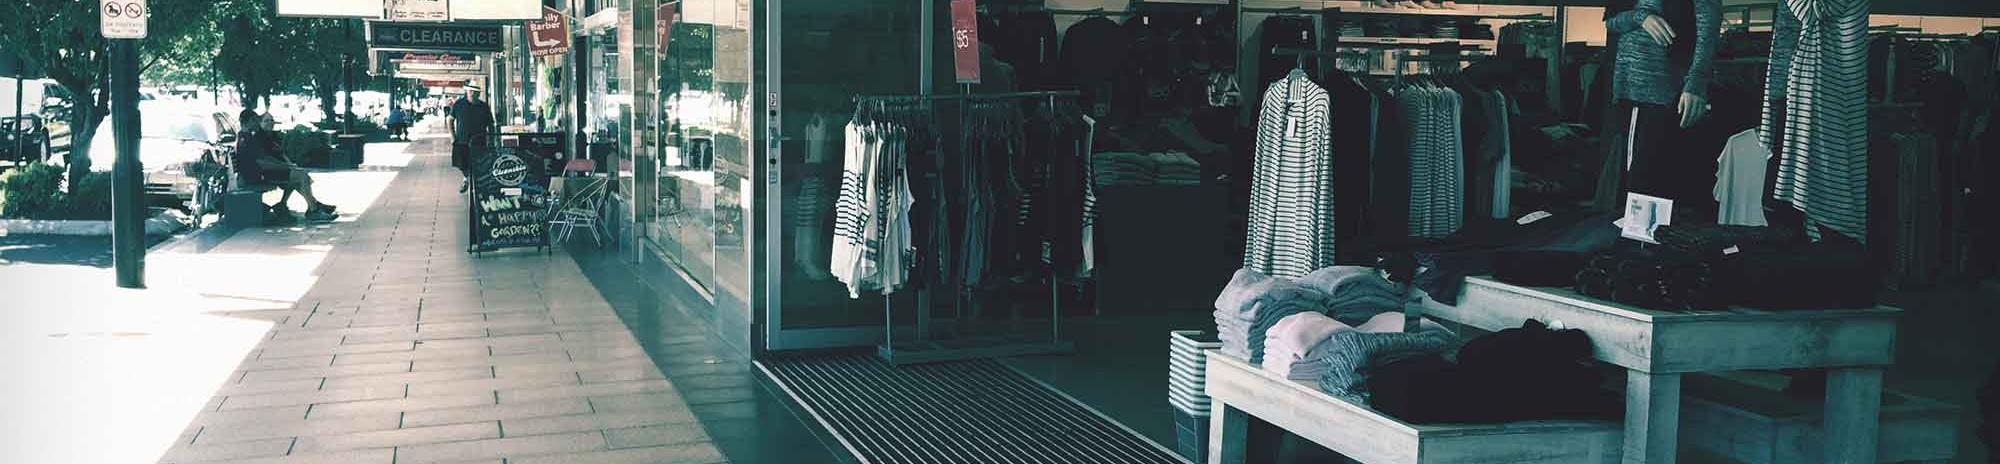 toowoomba-retail-waltons